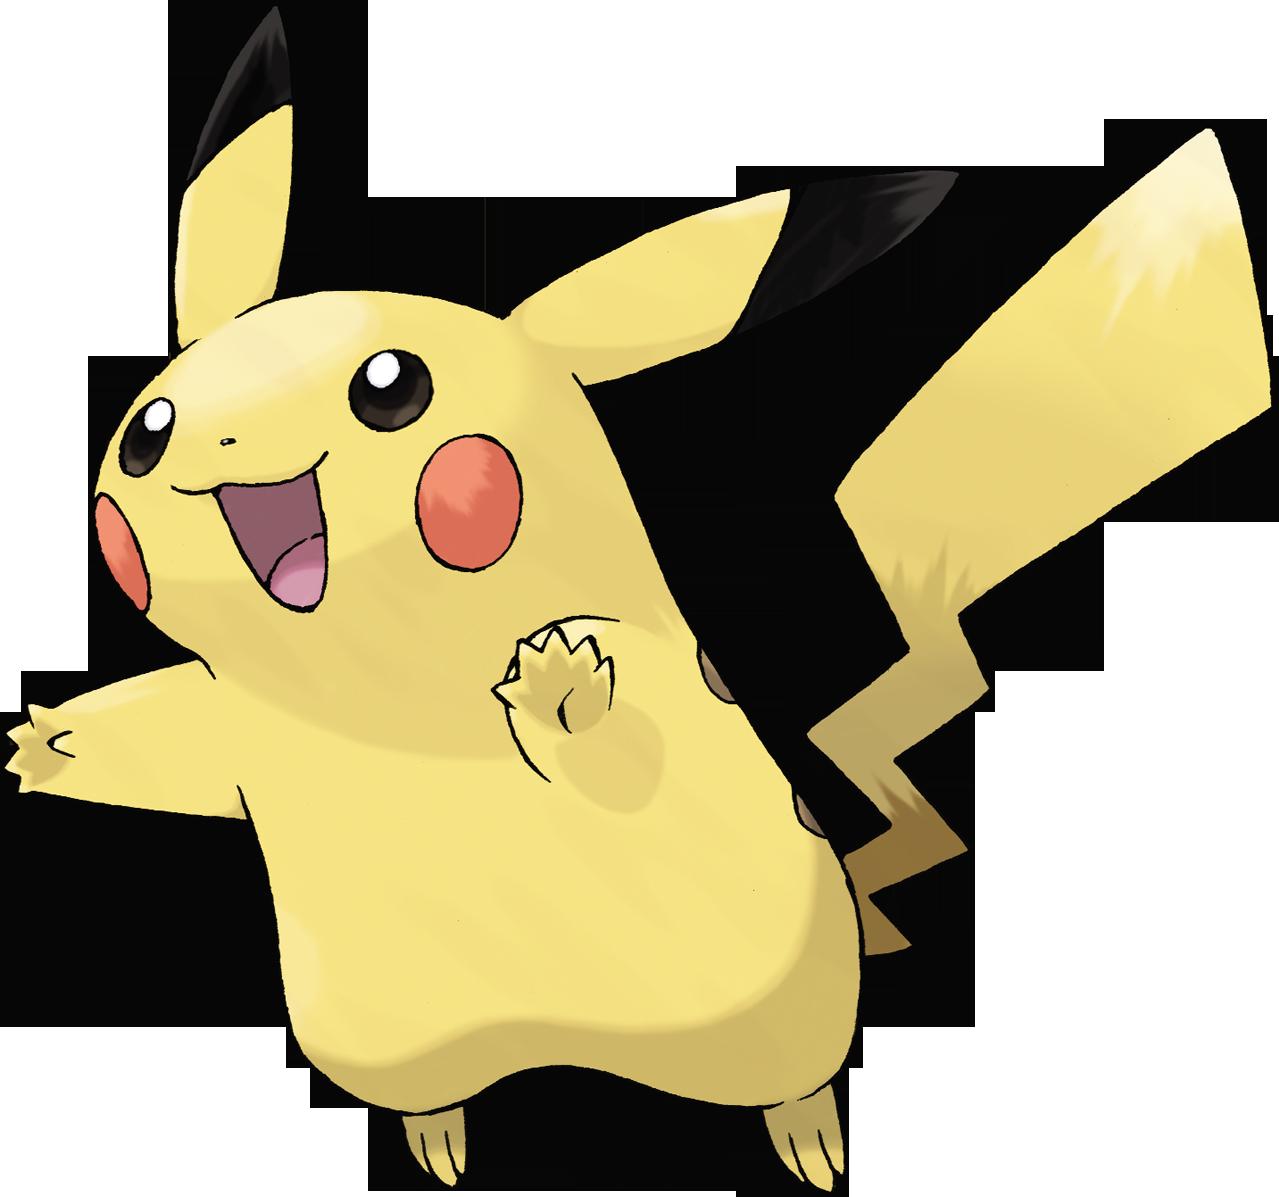 Clipart sleeping pikachu. Smashpedia fandom powered by